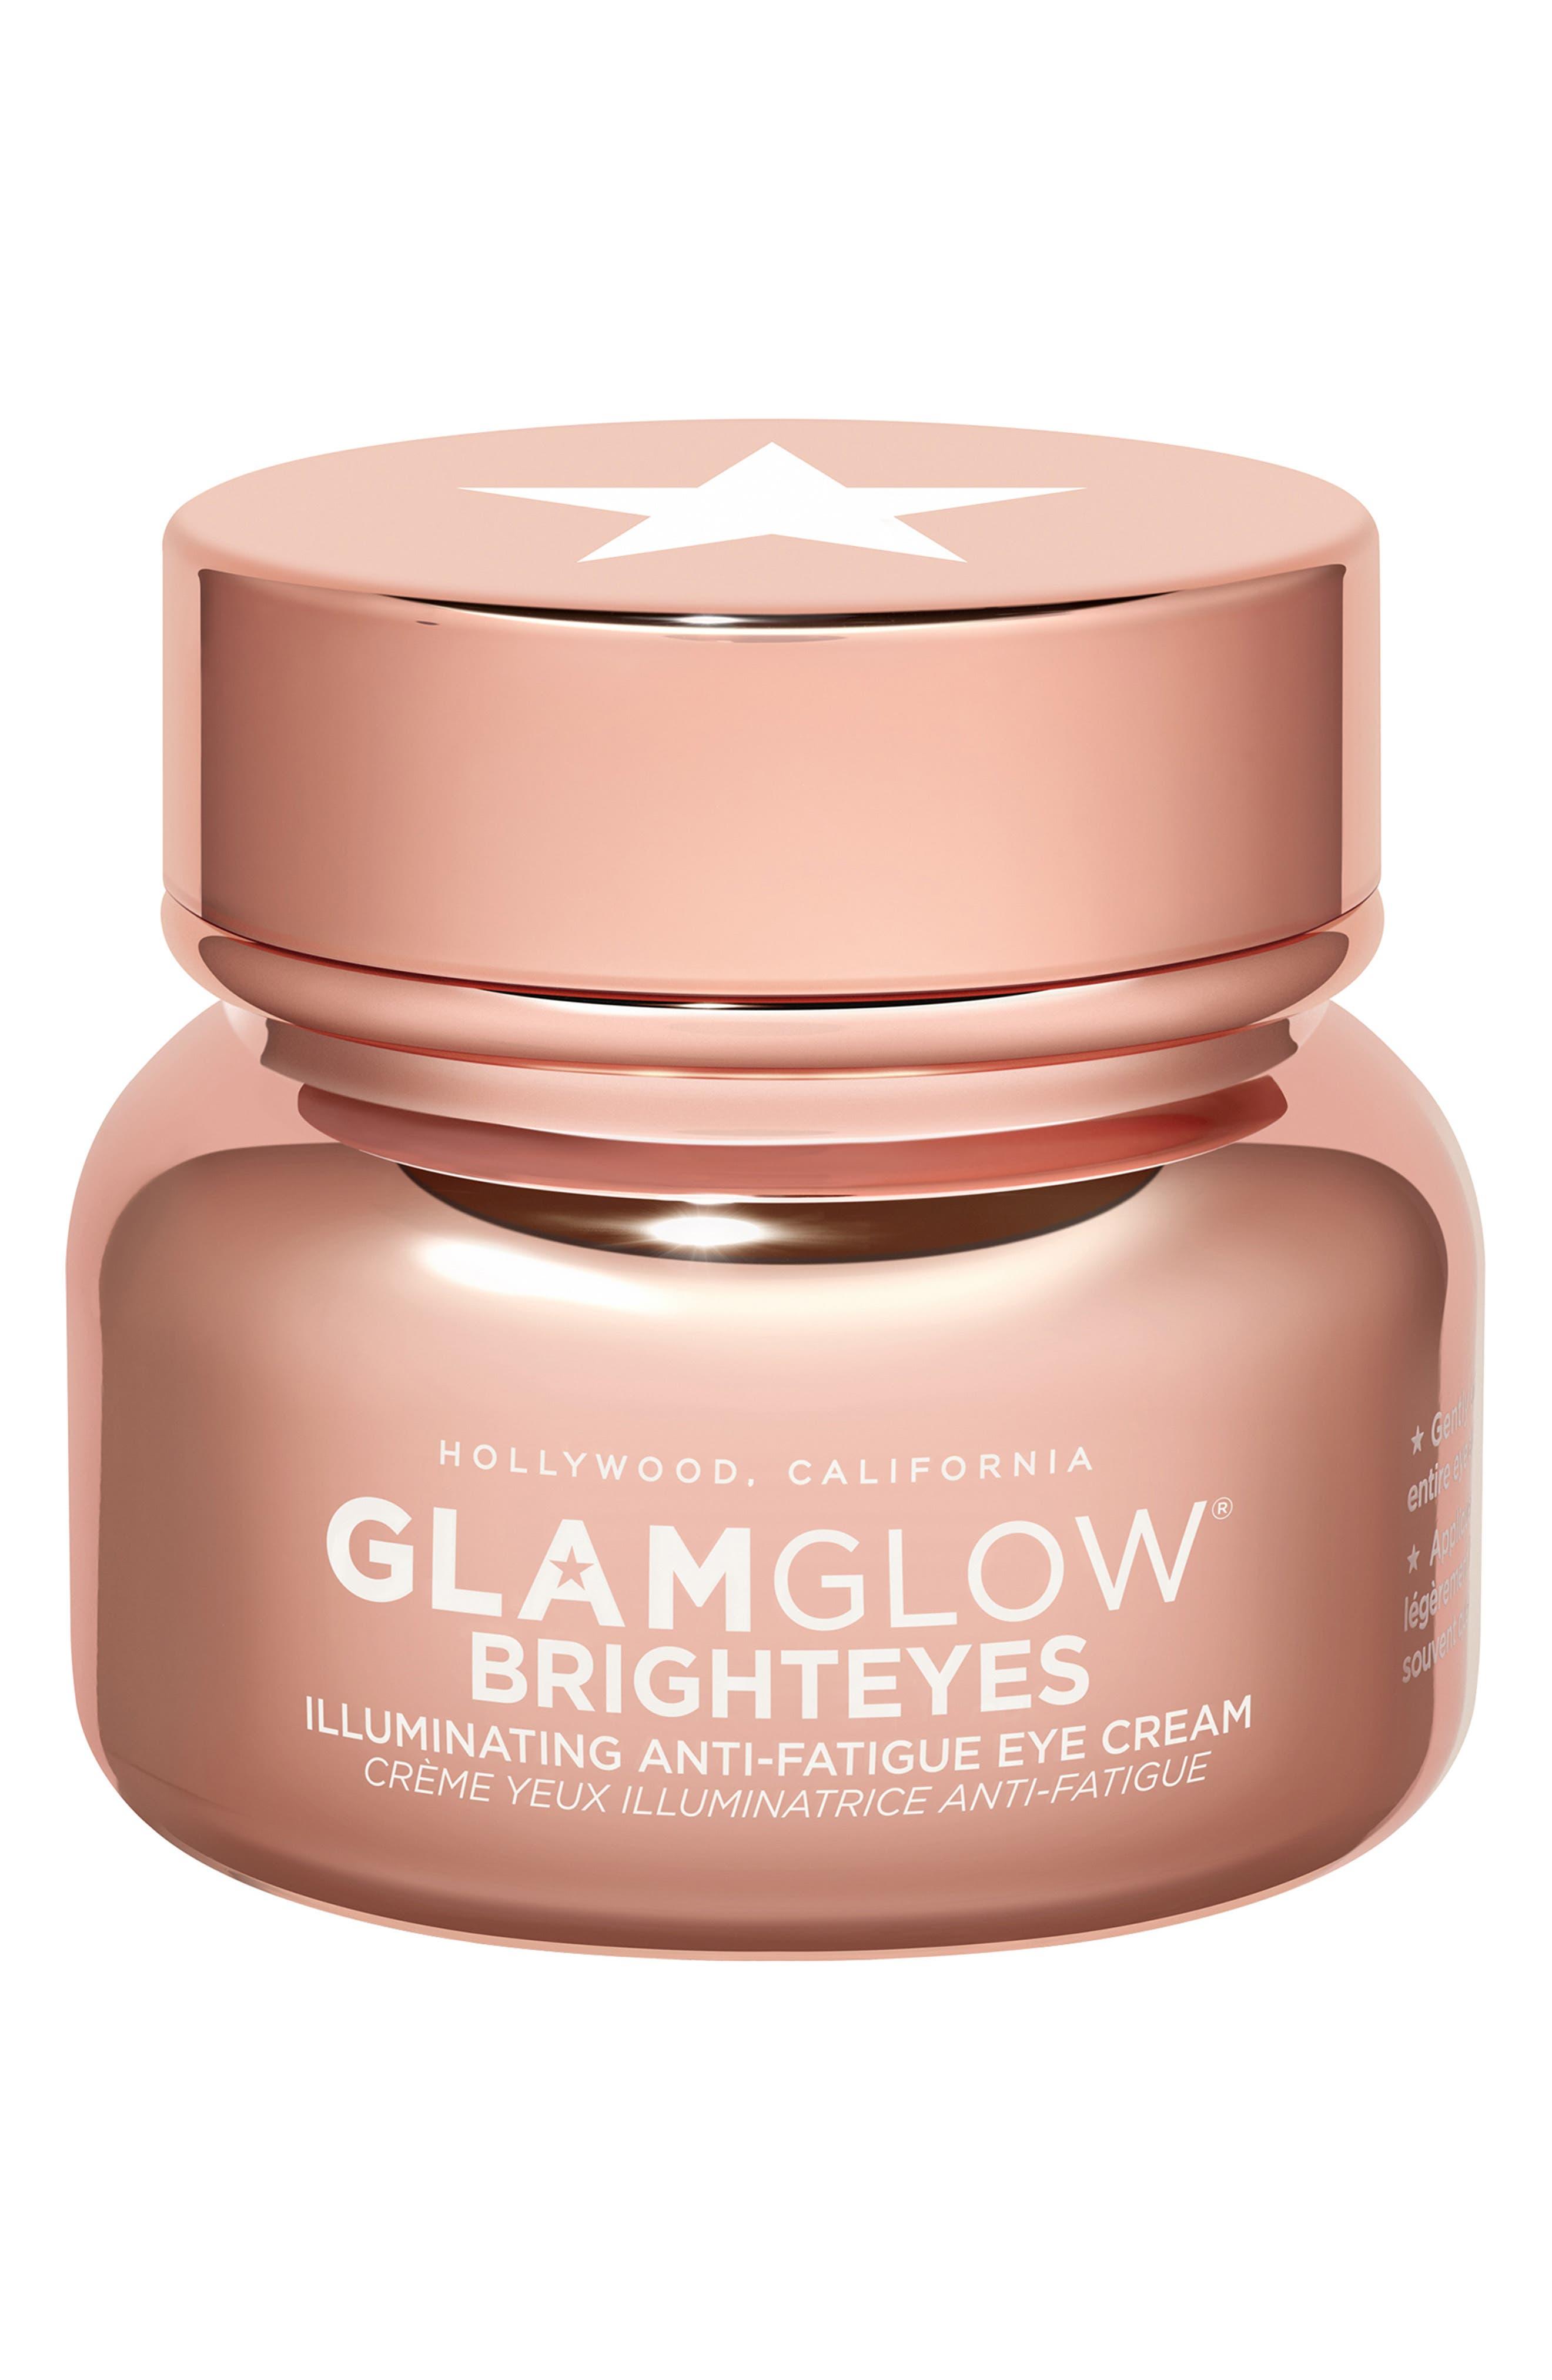 Glamglow Brighteyes Illuminating Anti-Fatigue Eye Cream